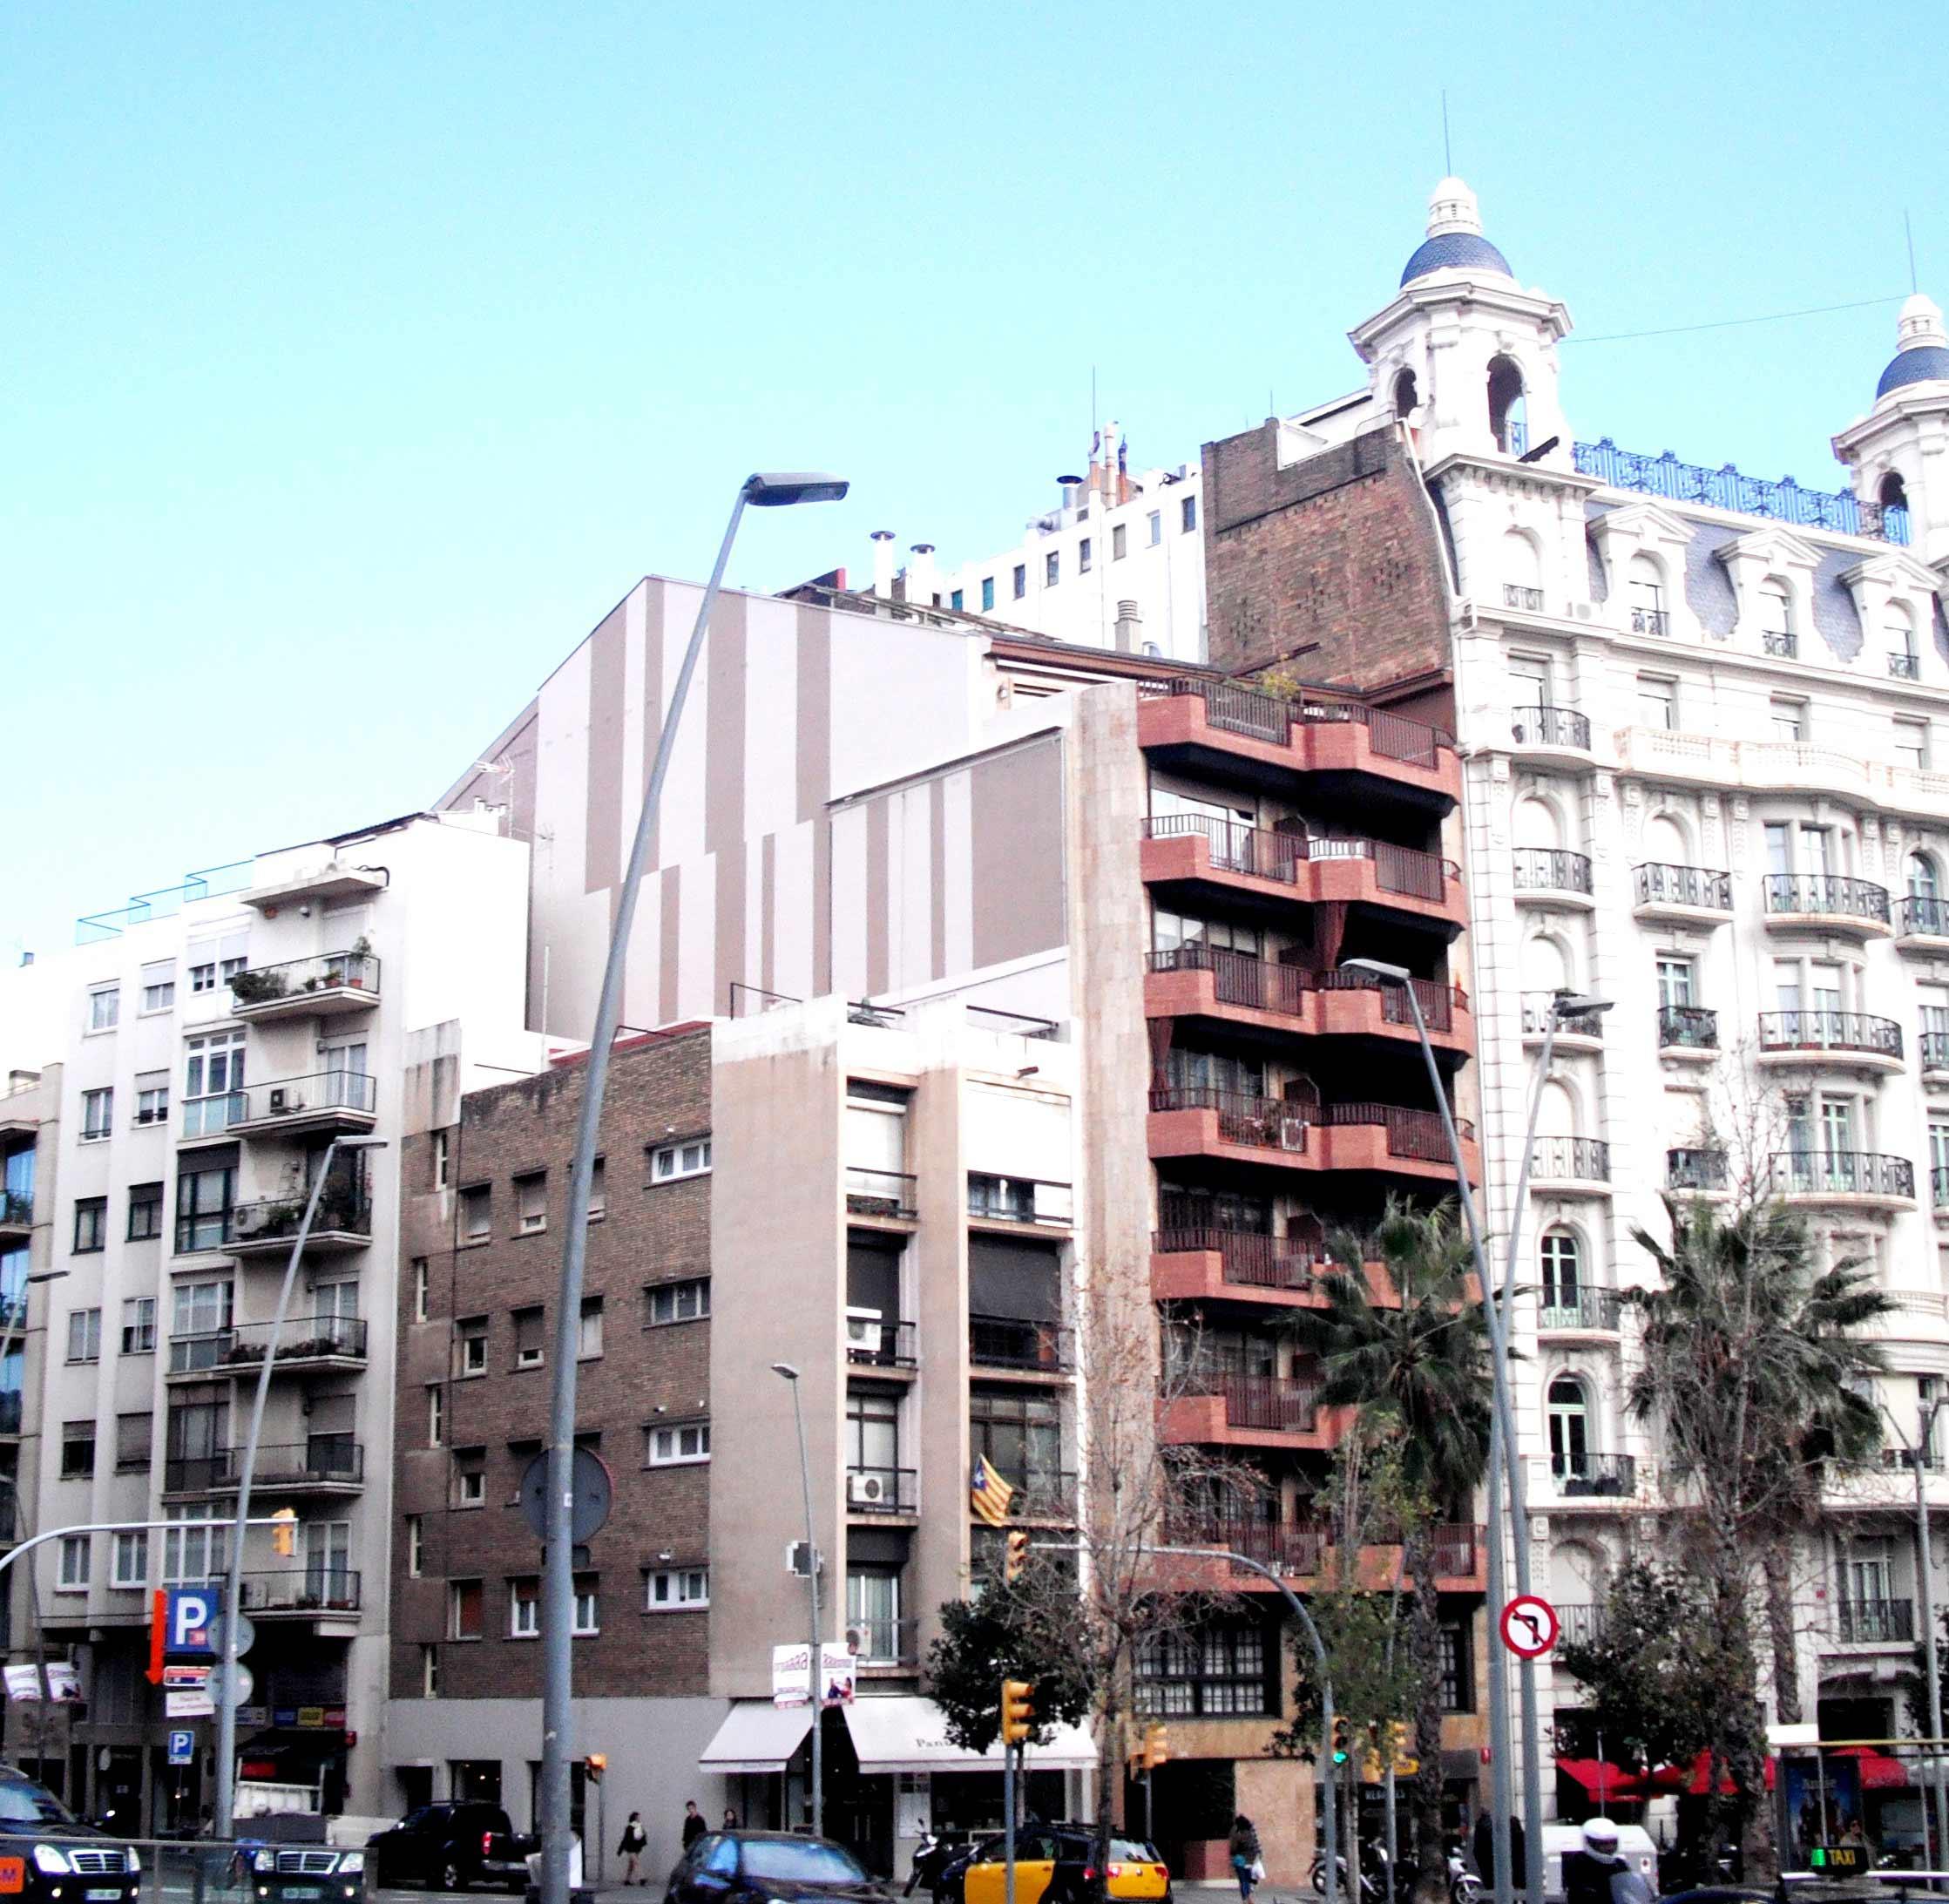 pym-medianera-publicidad-exterior-plaza-bonanova-despues-barcelona-vsa-comunicacion